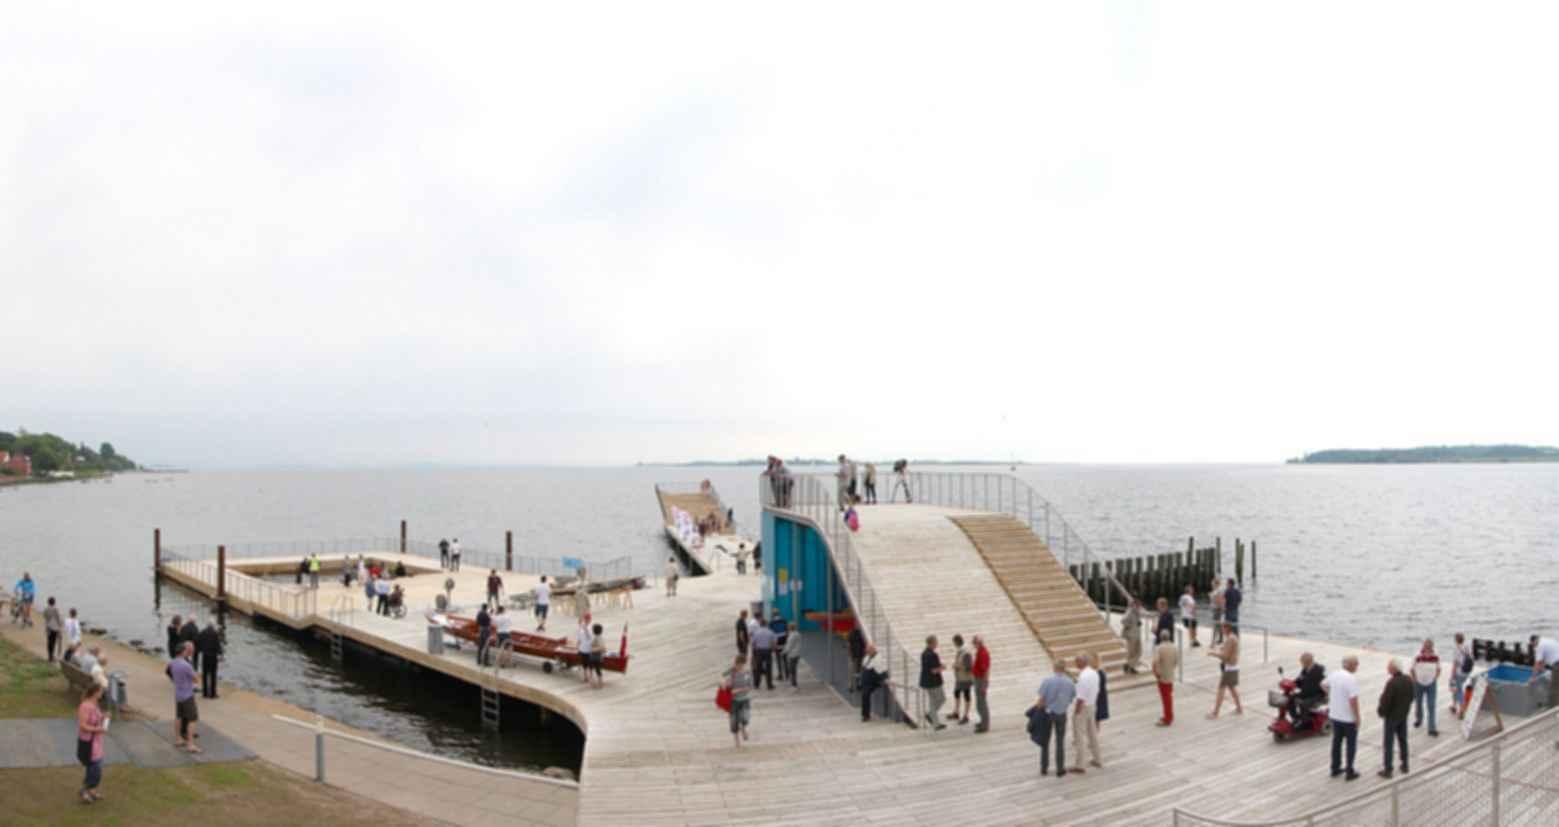 Faaborg Harbor Bath - Pier/Landscape